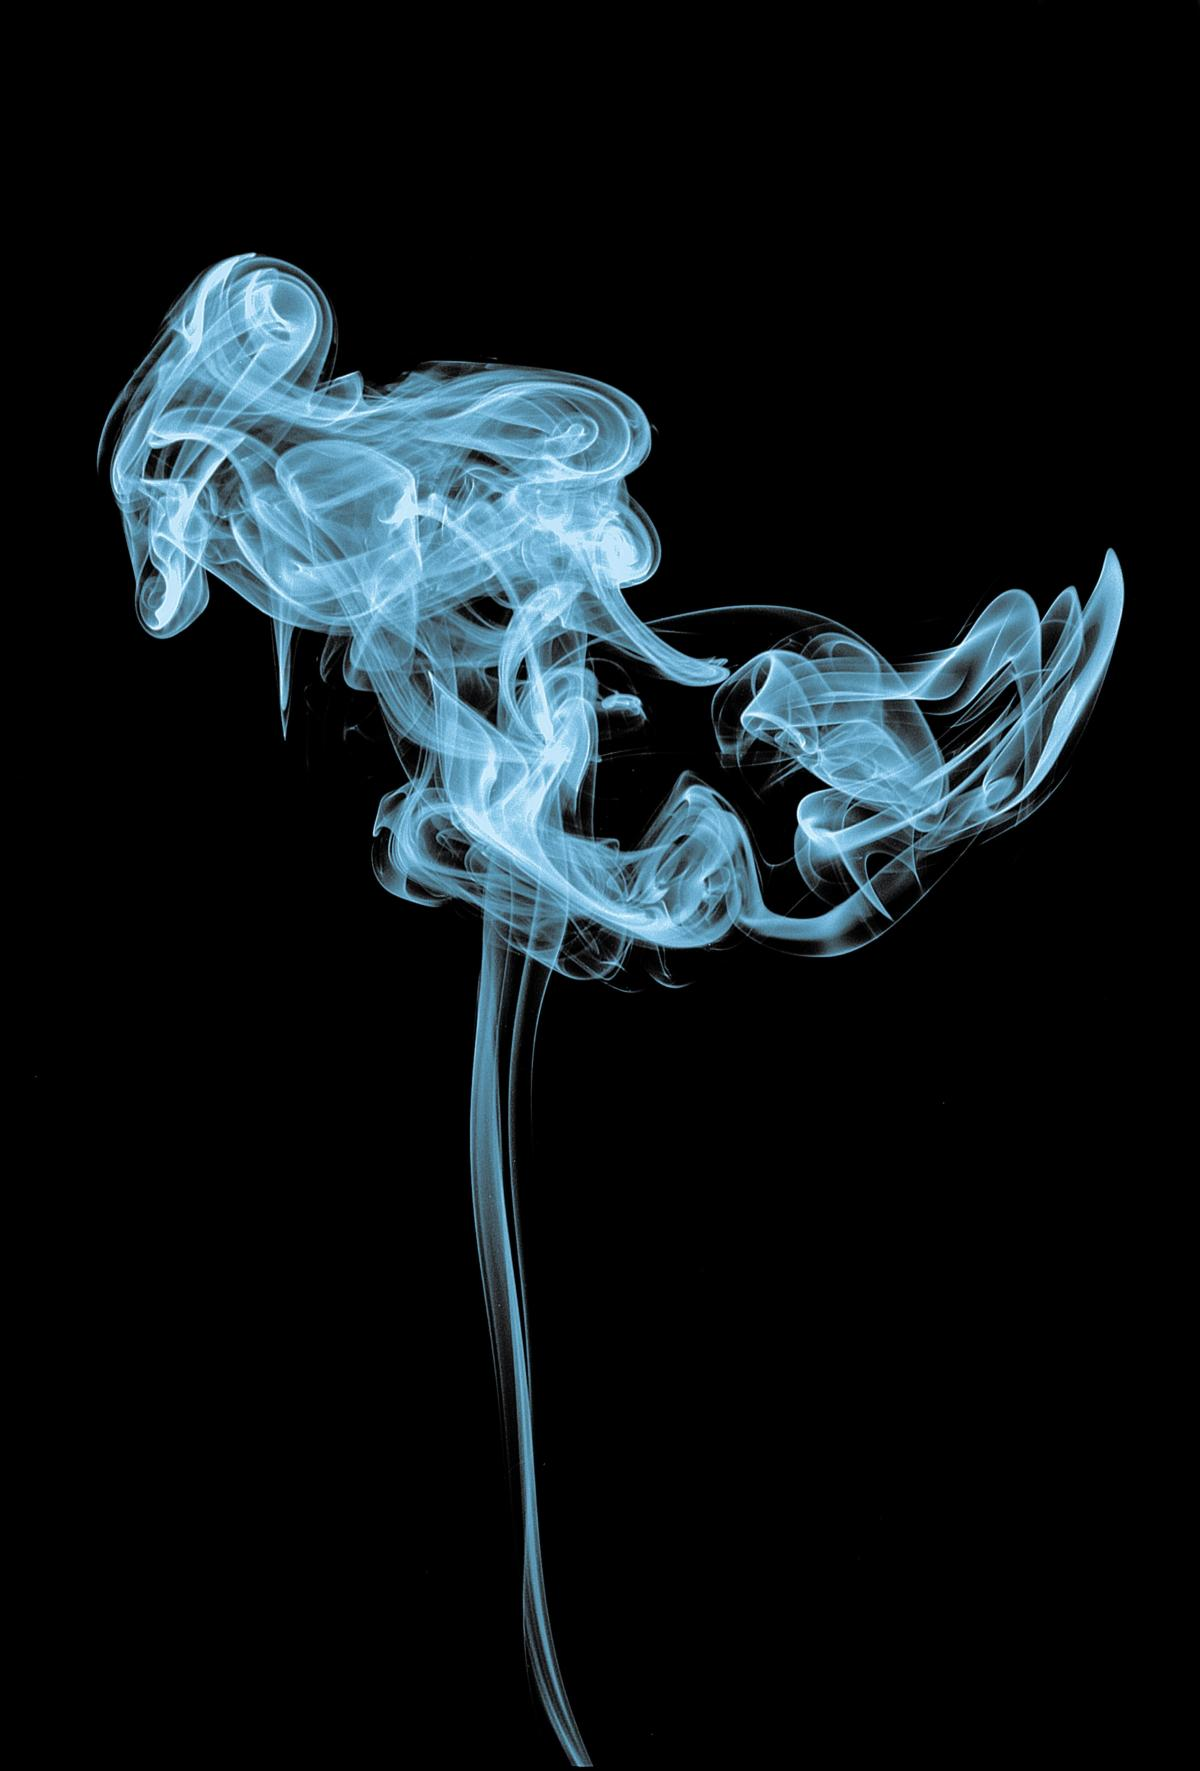 Smoke Anatomy Medical